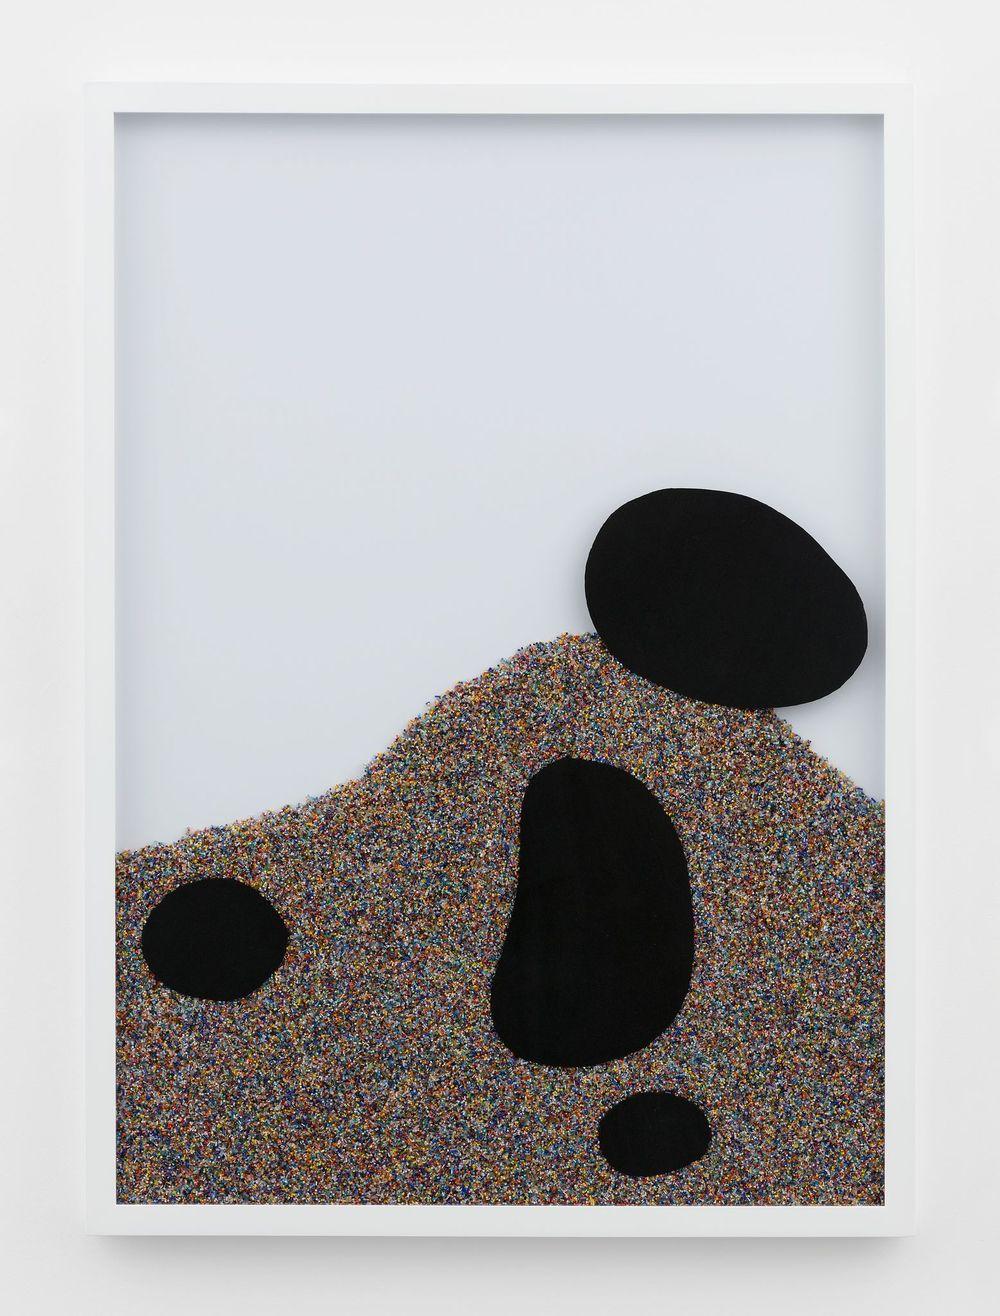 Artist:萊諾·艾斯提夫, Exhibition:Chemical Landscape